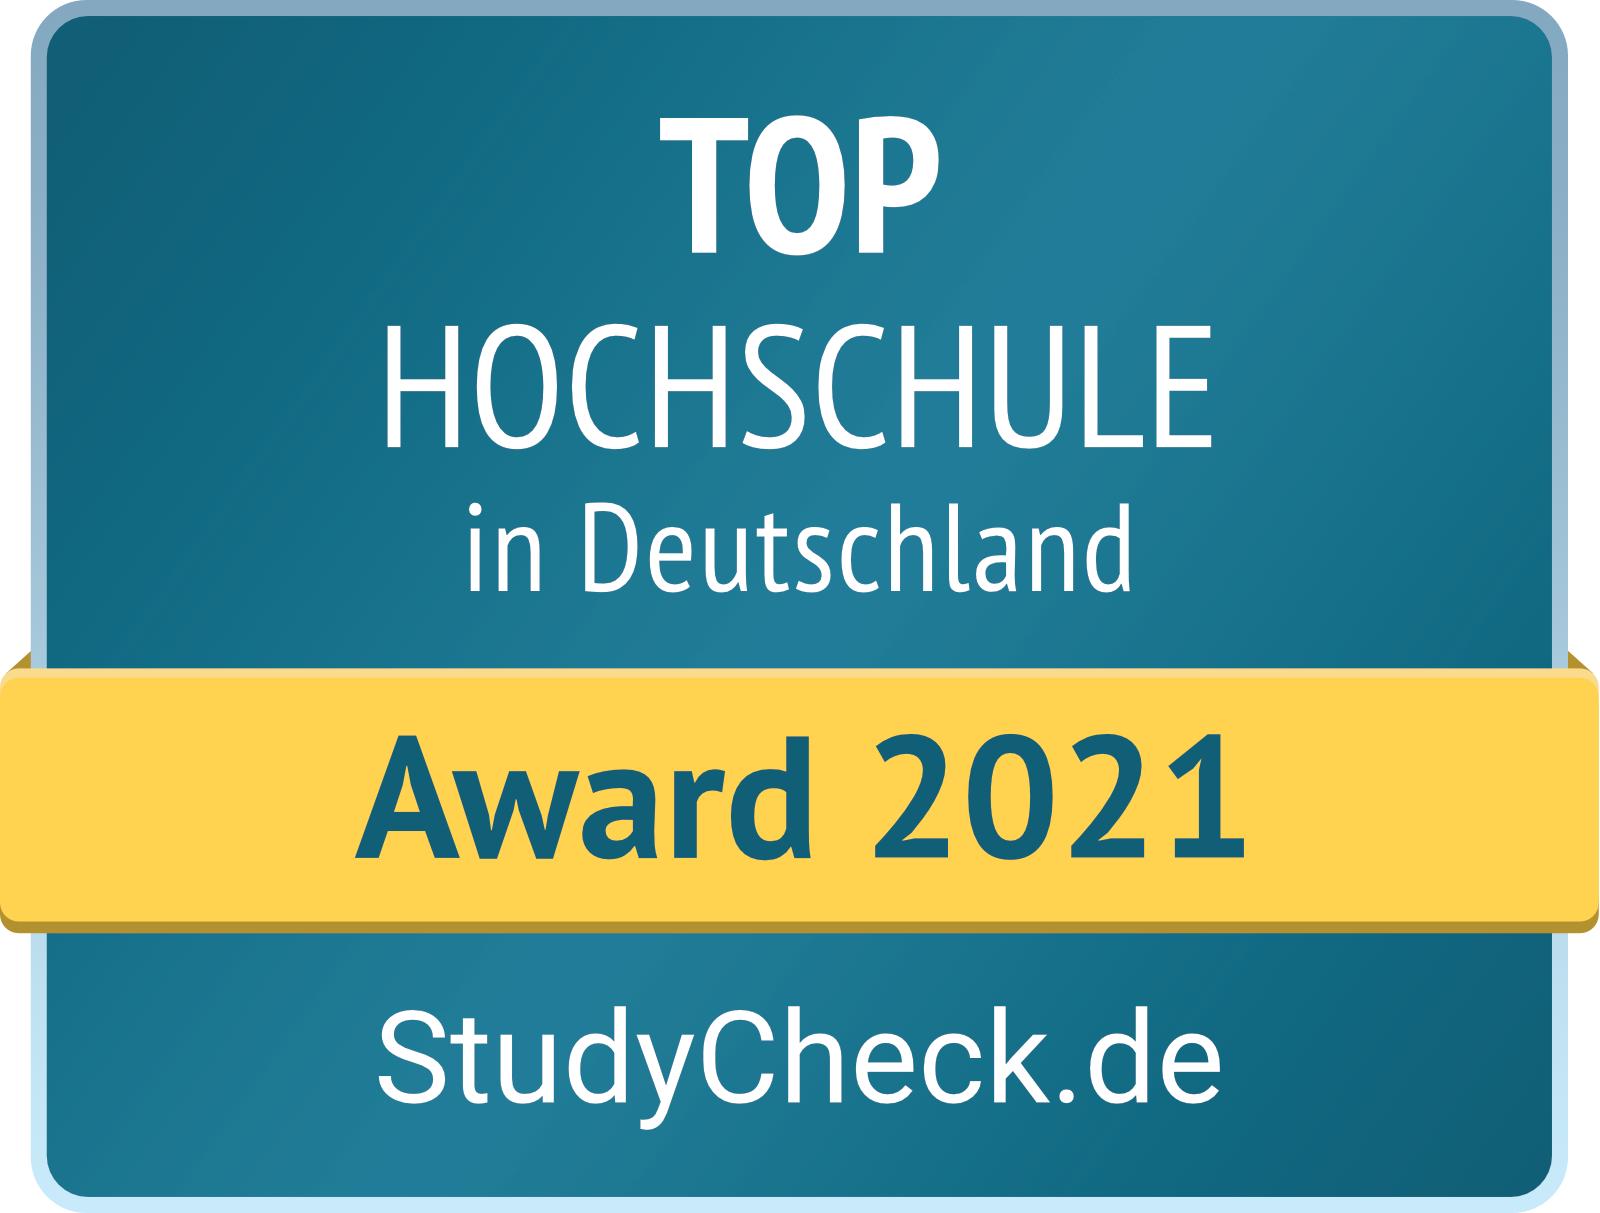 Logo Studycheck.de: Award 2021 / Top Hochschule in Deutschland